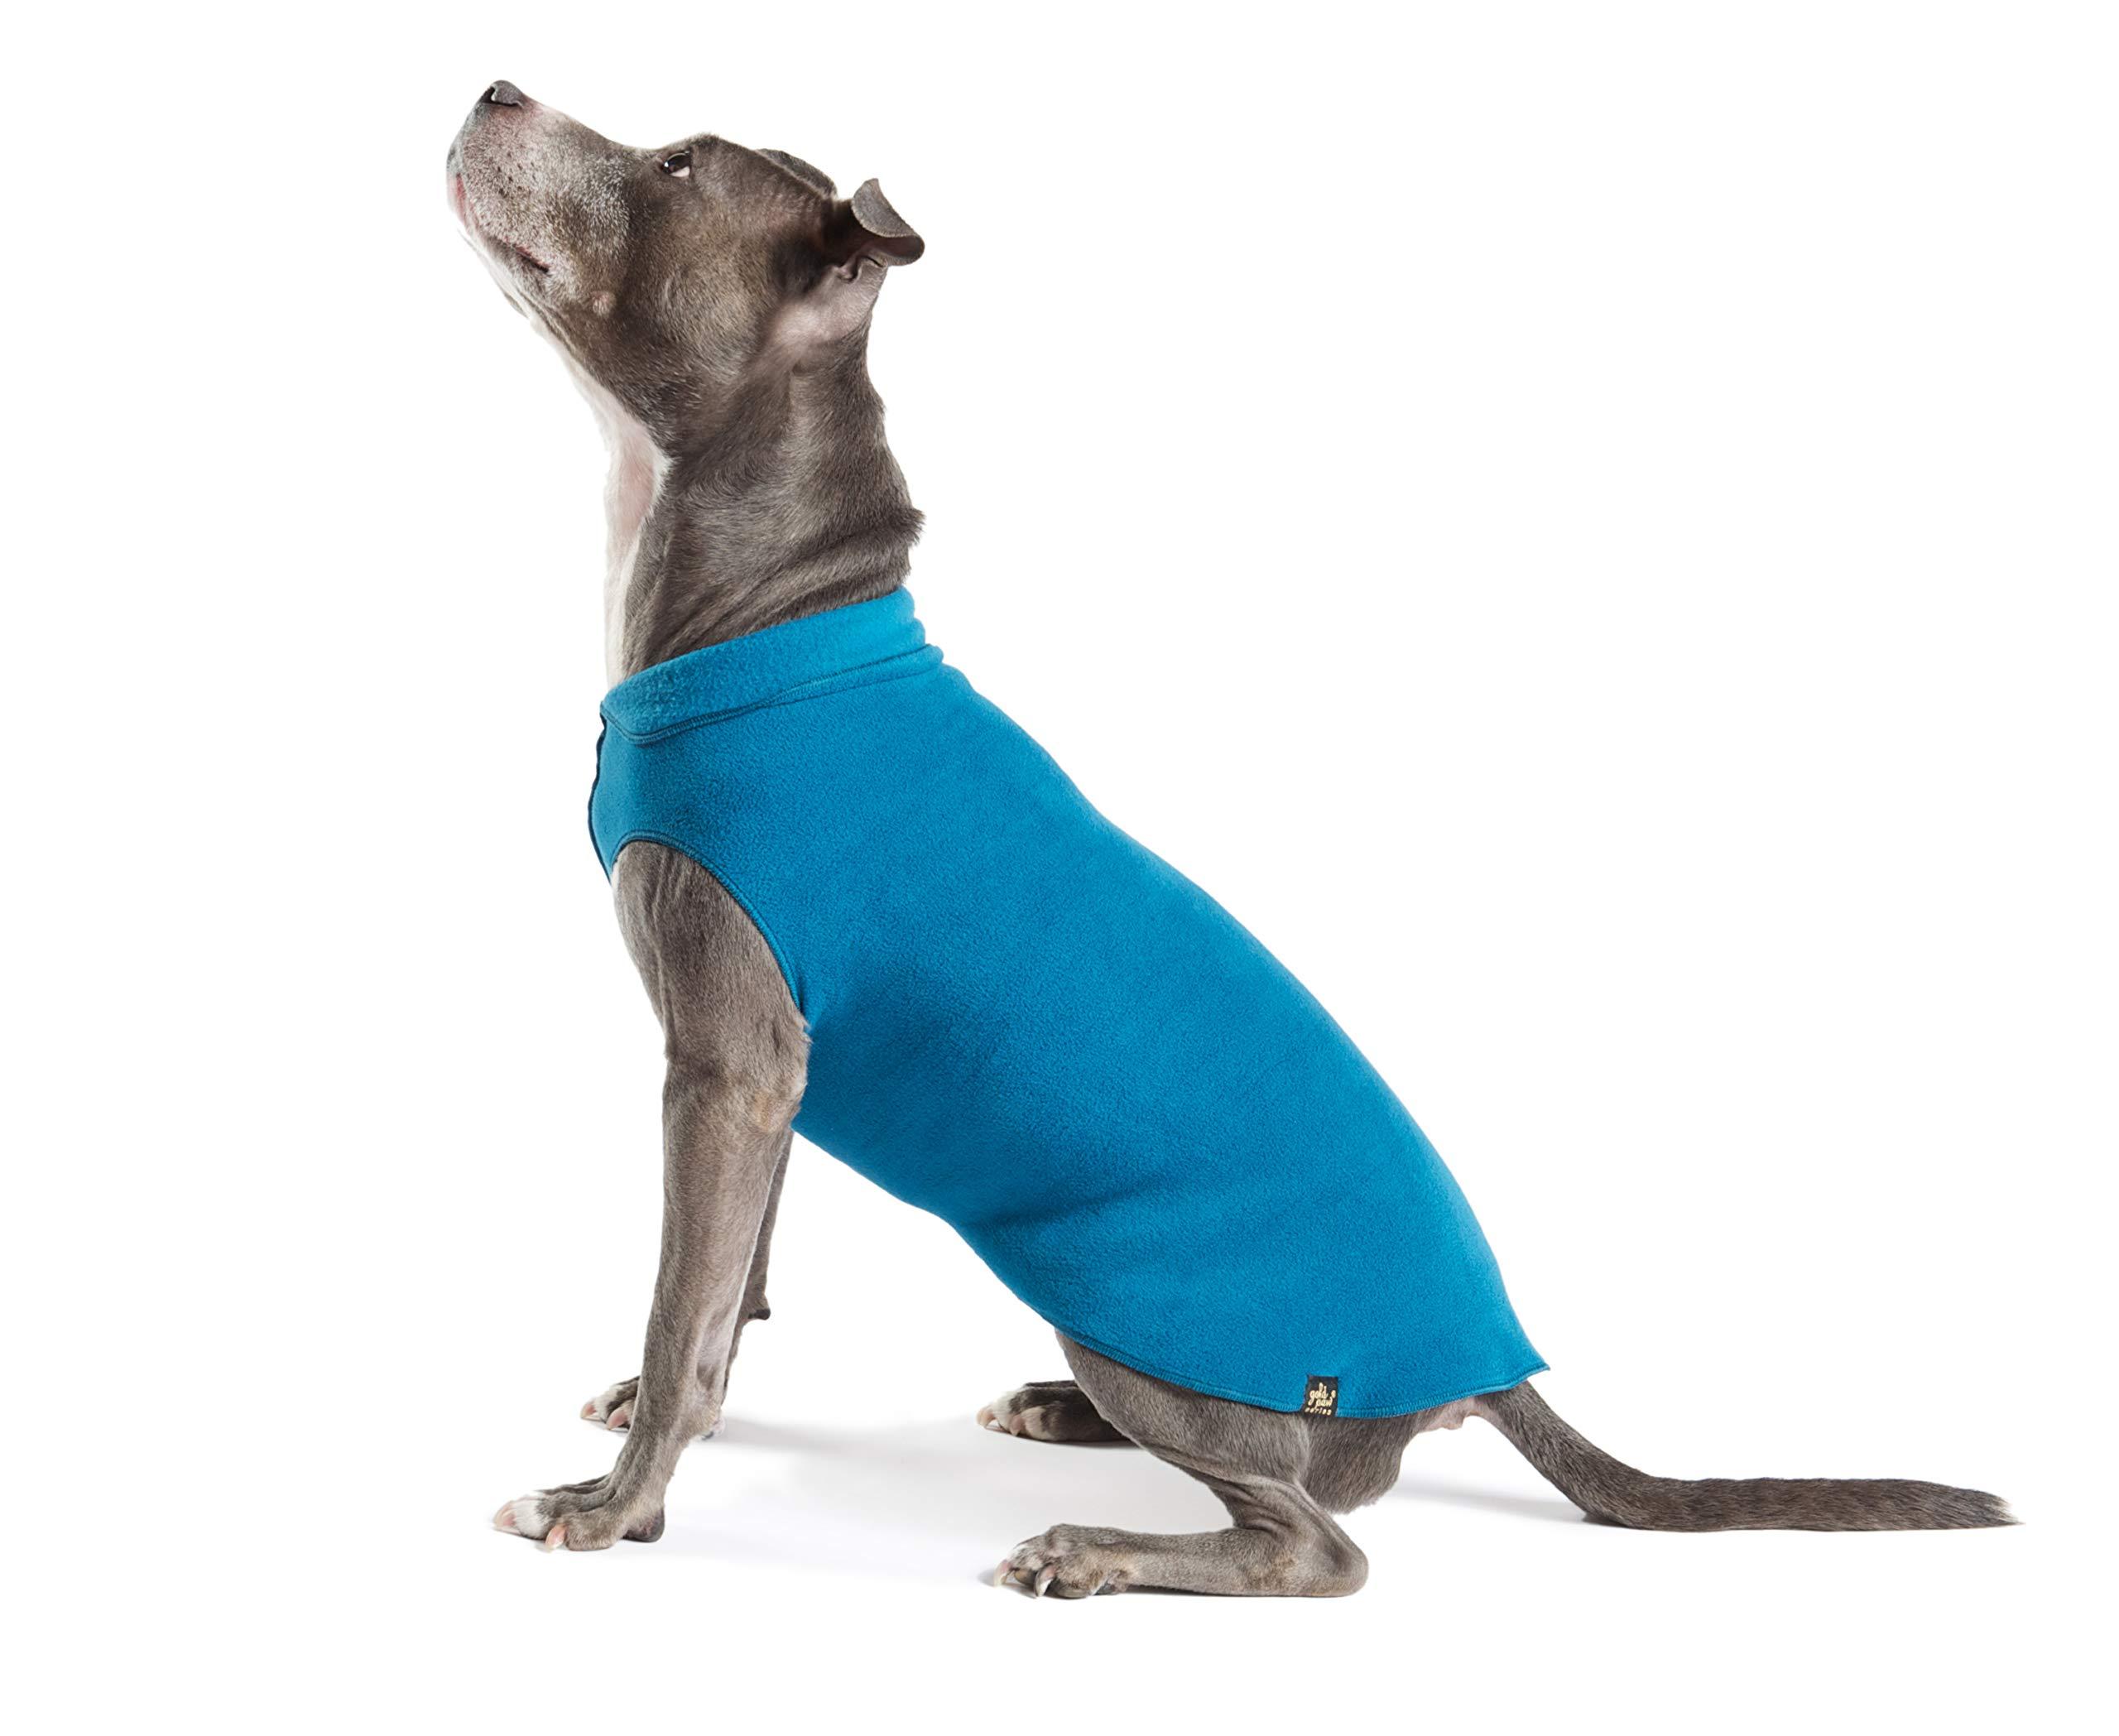 Gold Paw Stretch Fleece Dog Coat - Soft, Warm Dog Clothes, Stretchy Pet Sweater - Machine Washable, Eco Friendly - All Season, Marine Blue, Size 22 by Gold Paw